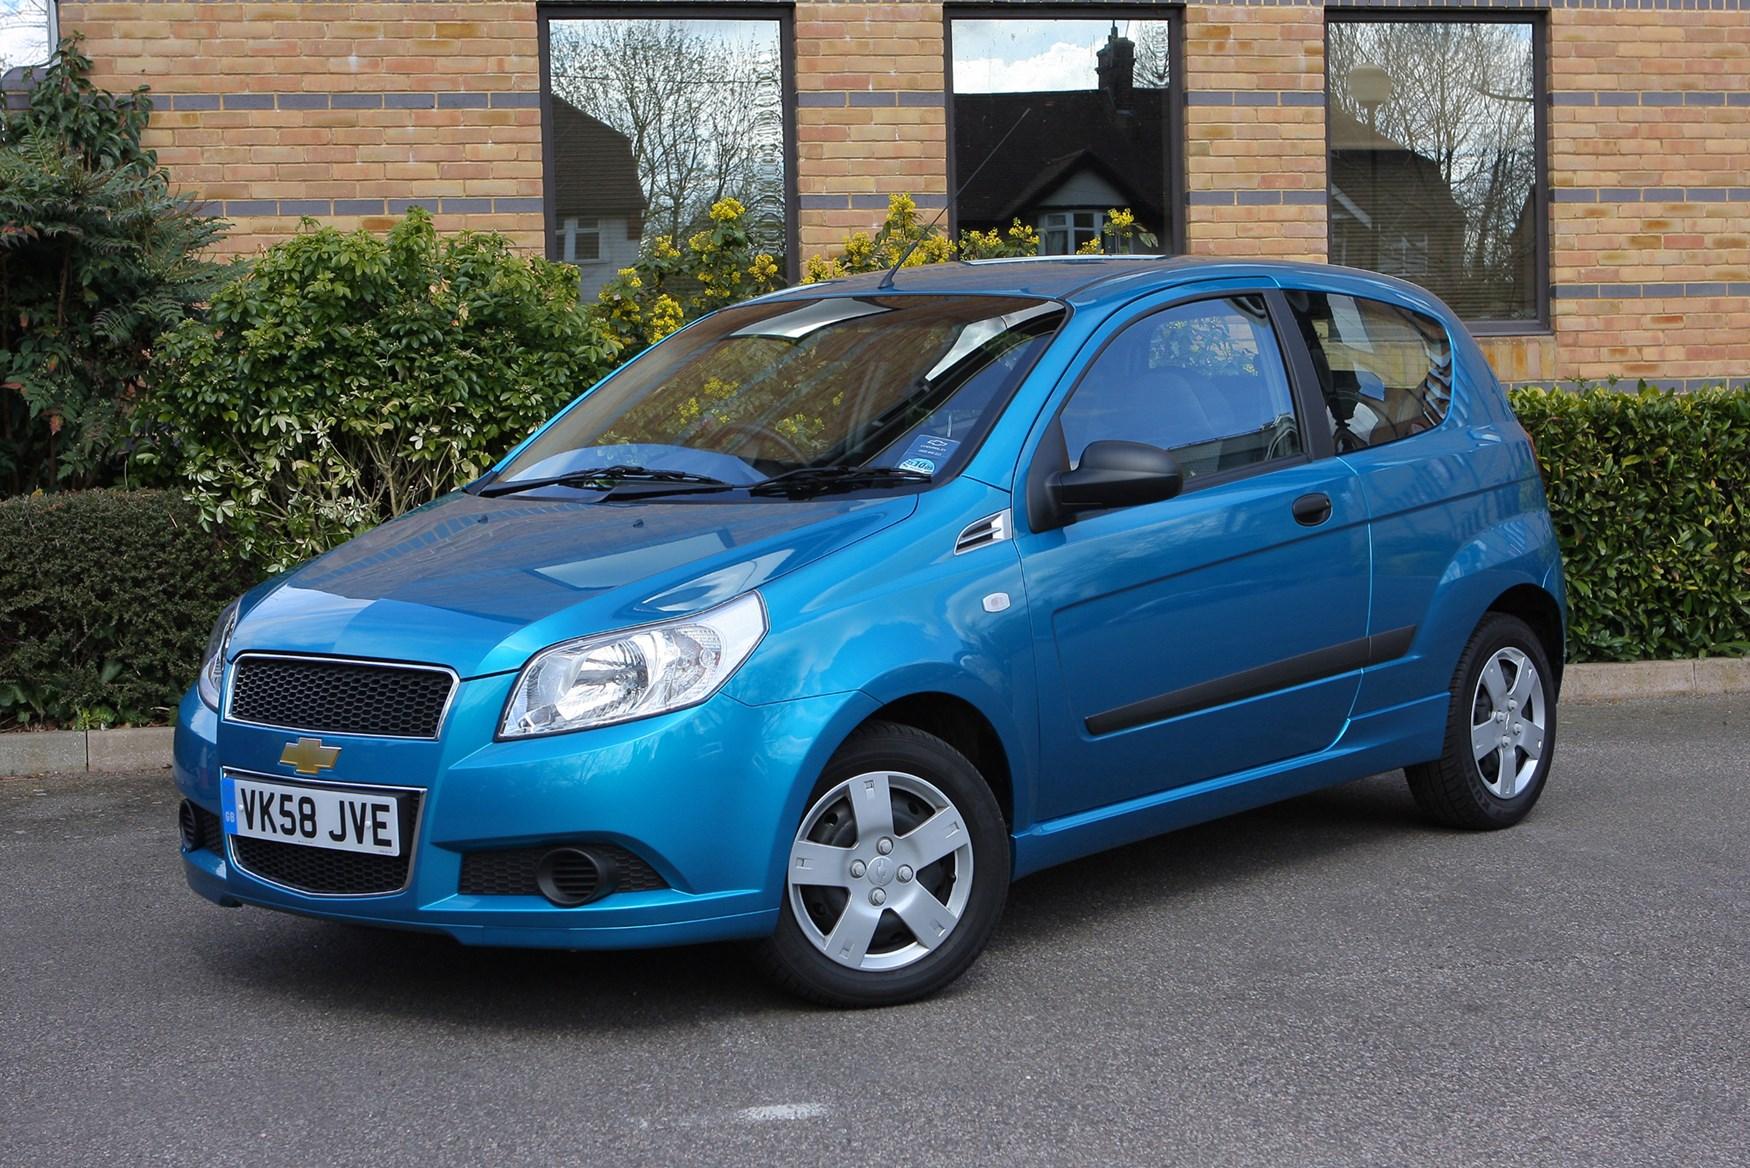 2009 Chevrolet Aveo For Sale Cargurus | Autos Post